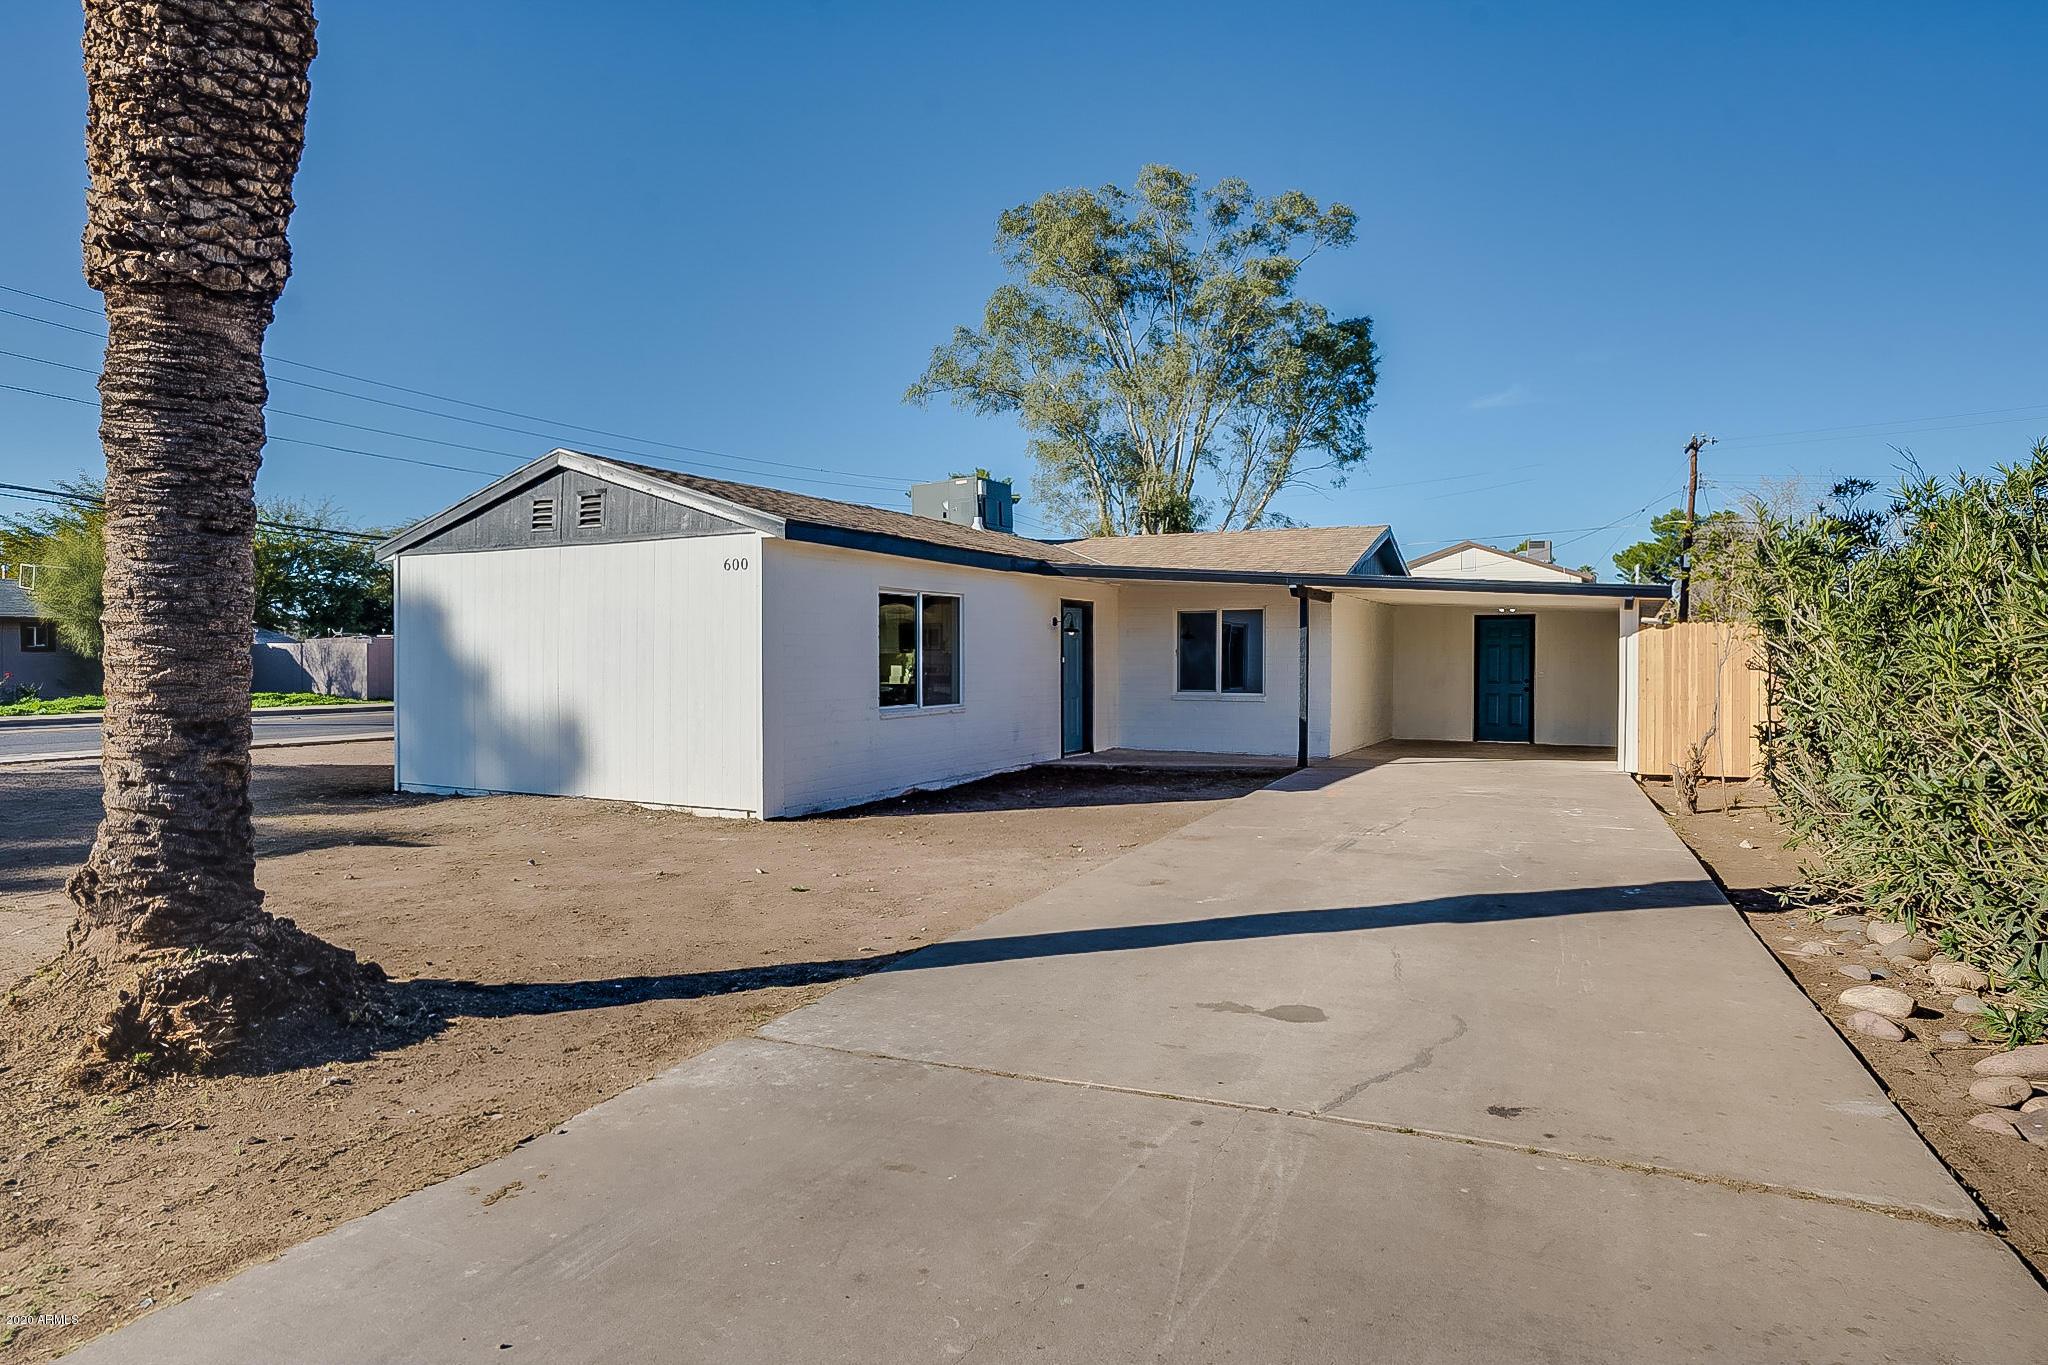 Photo of 600 E DETROIT Street, Chandler, AZ 85225